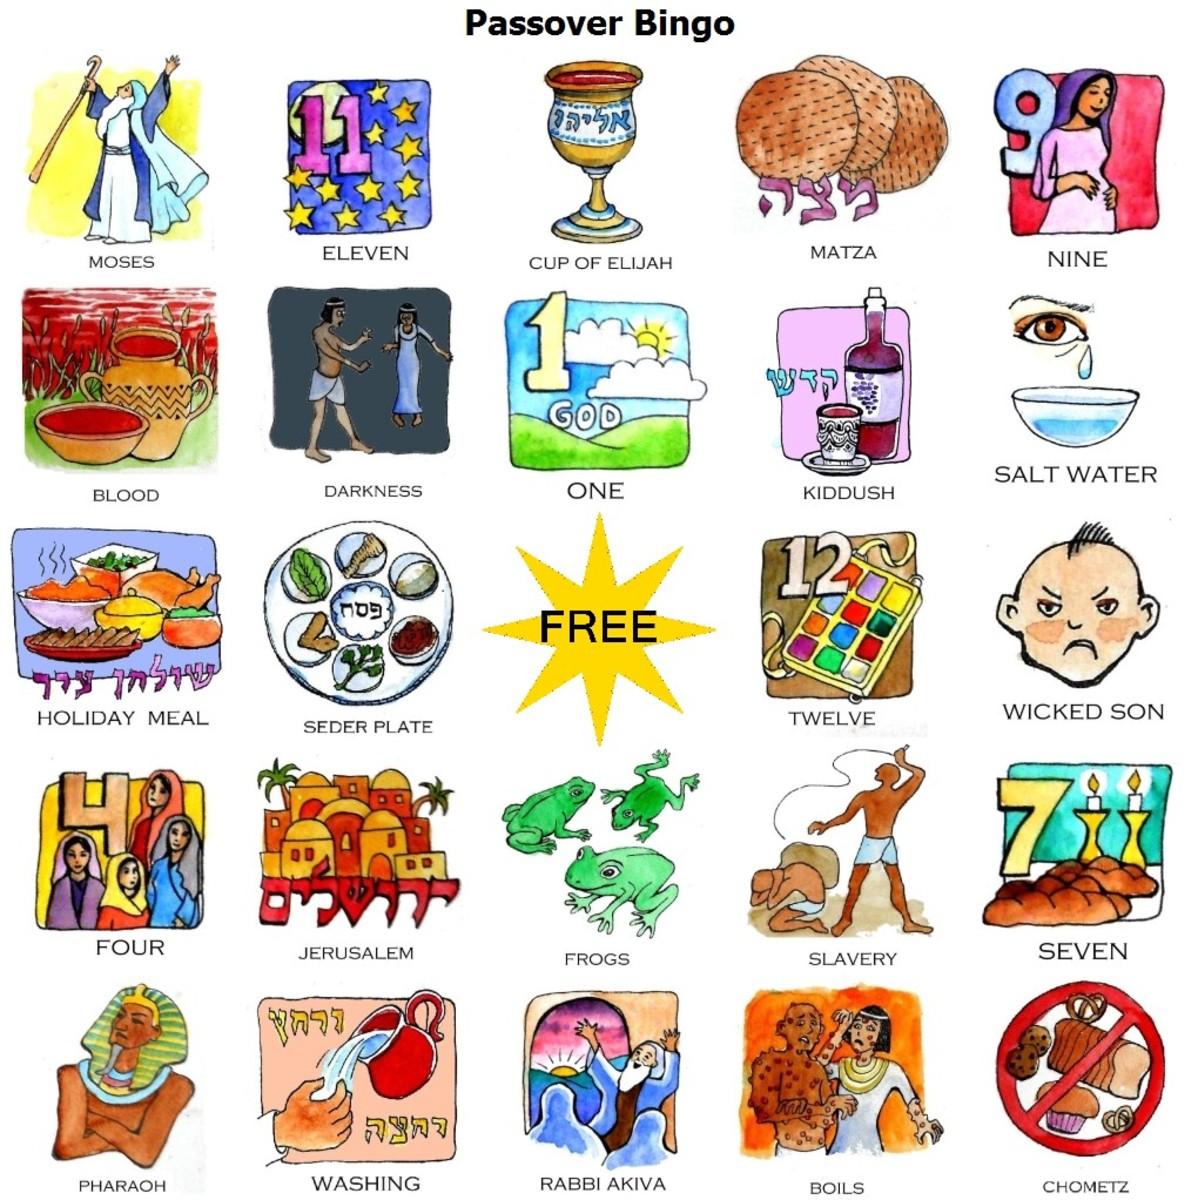 passover bingo2